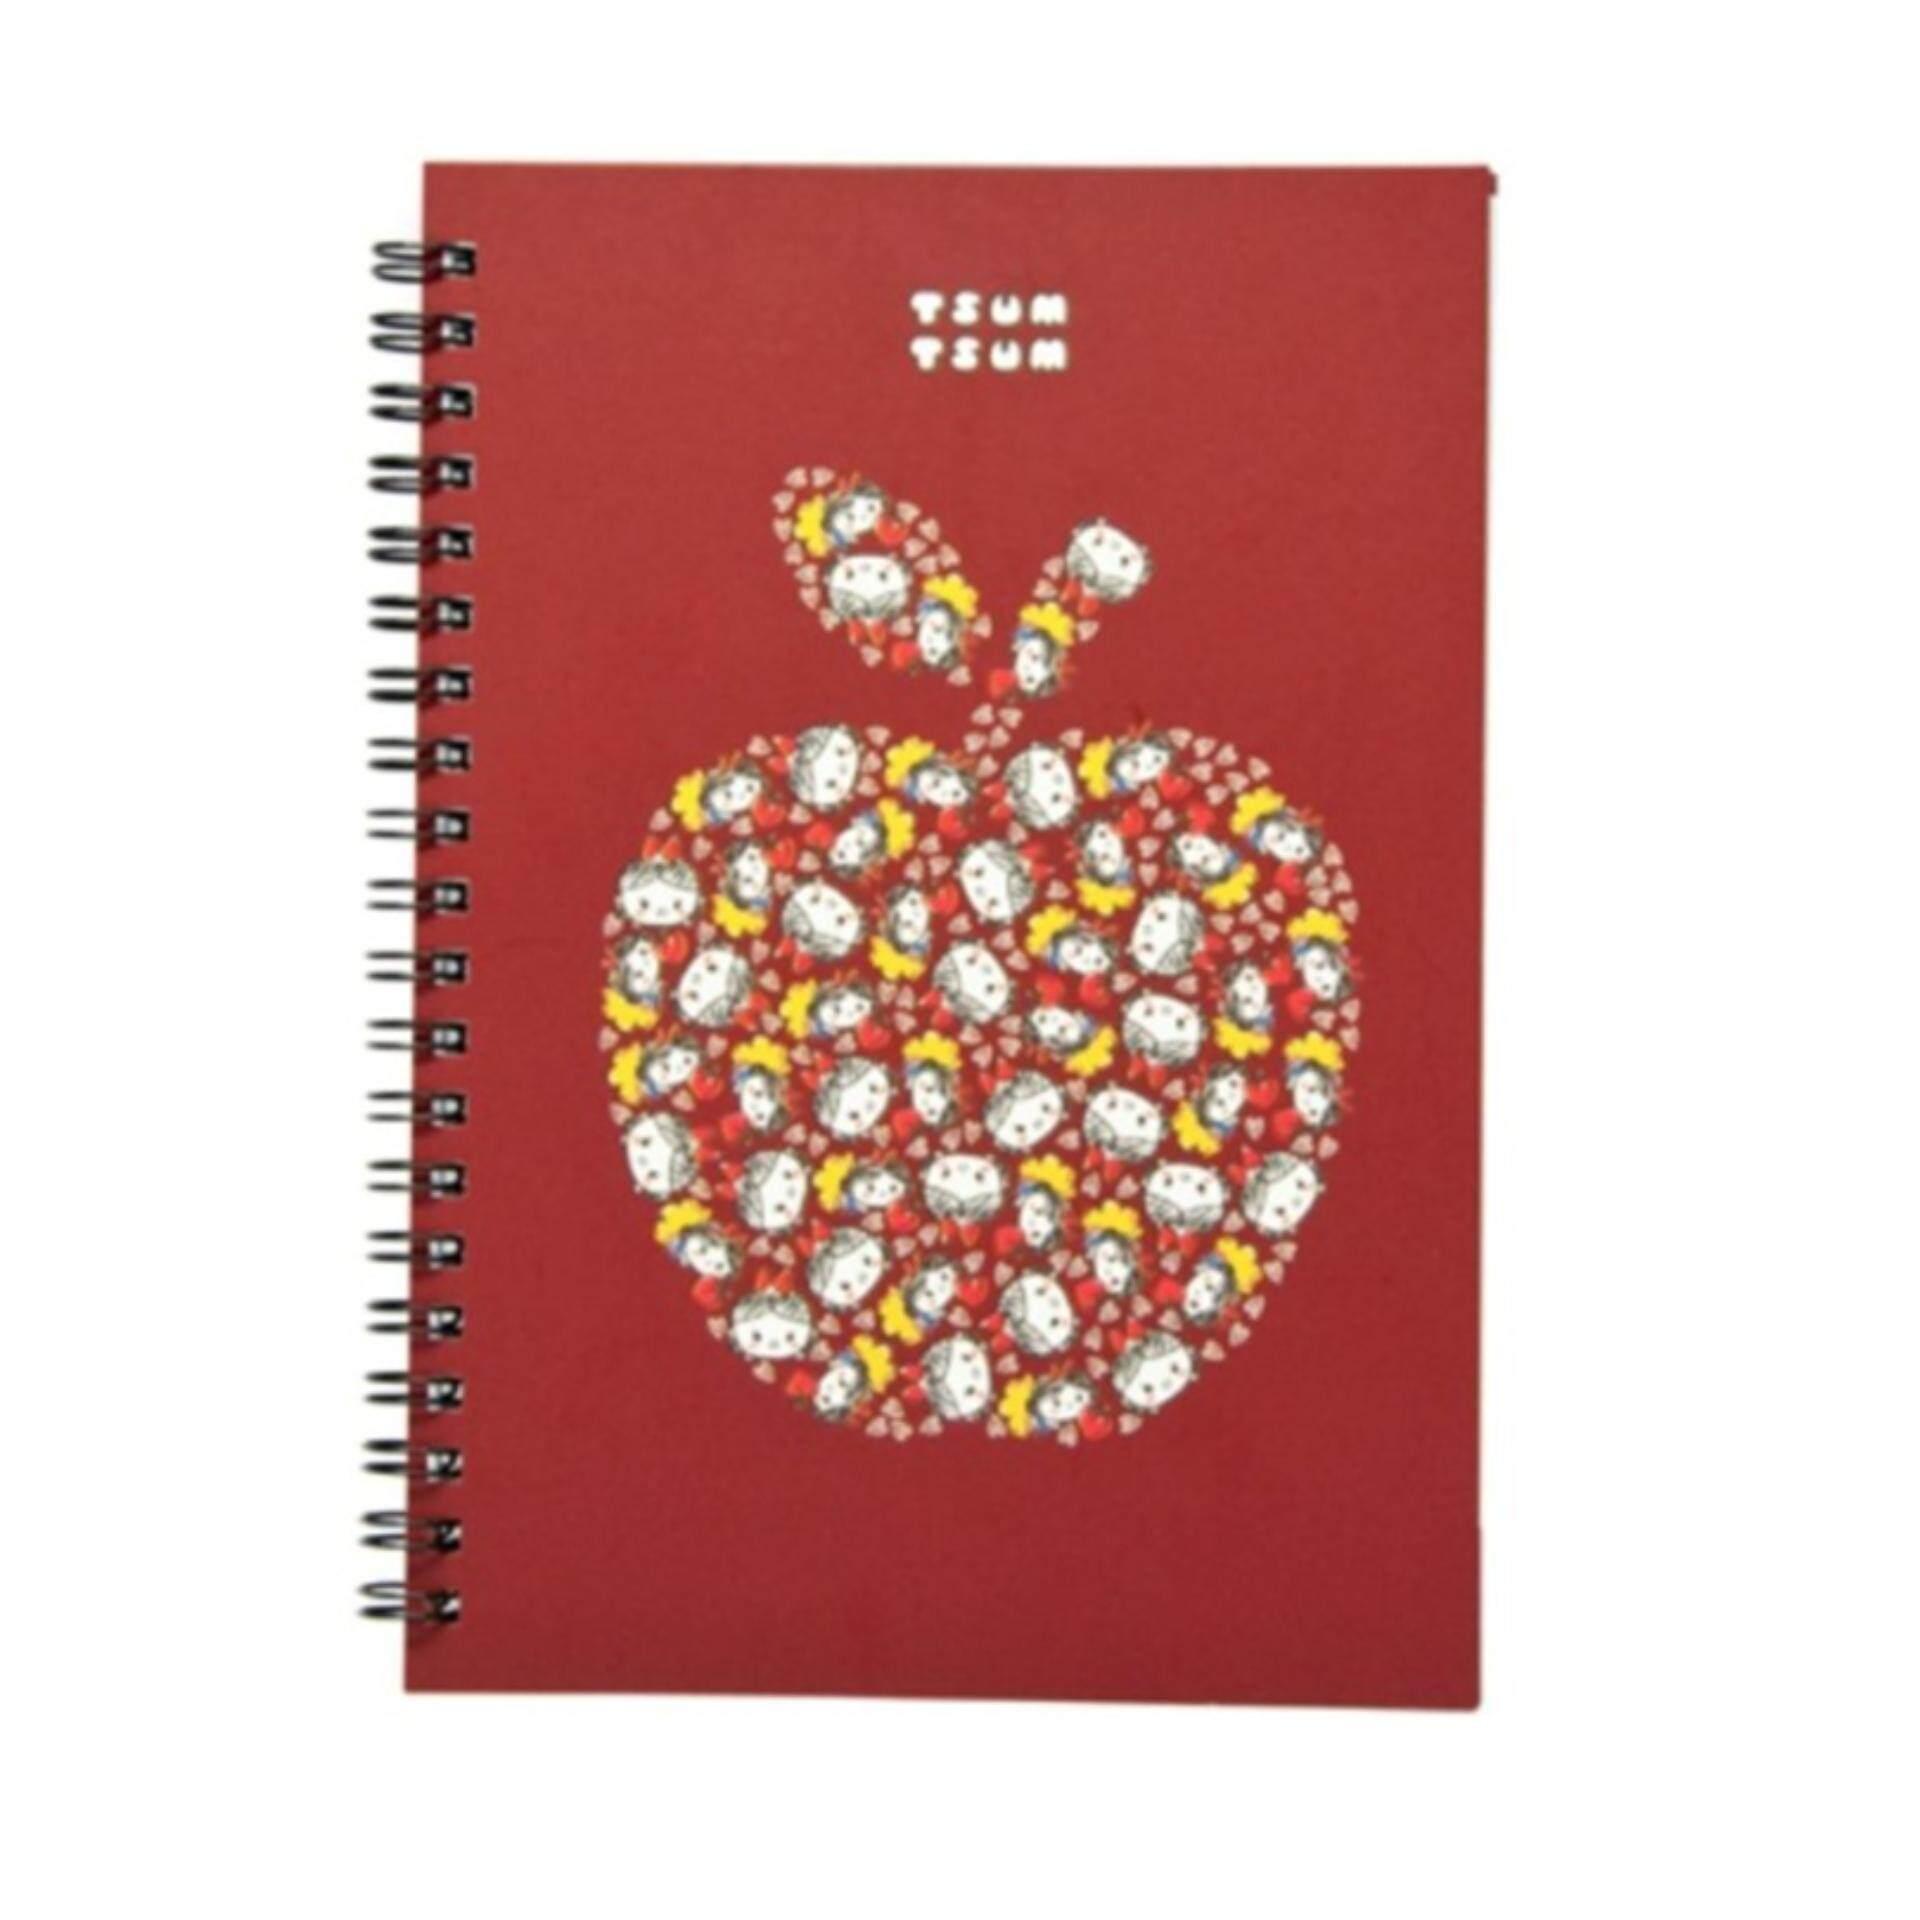 Disney Tsum Tsum Notebook - Dark Red Colour